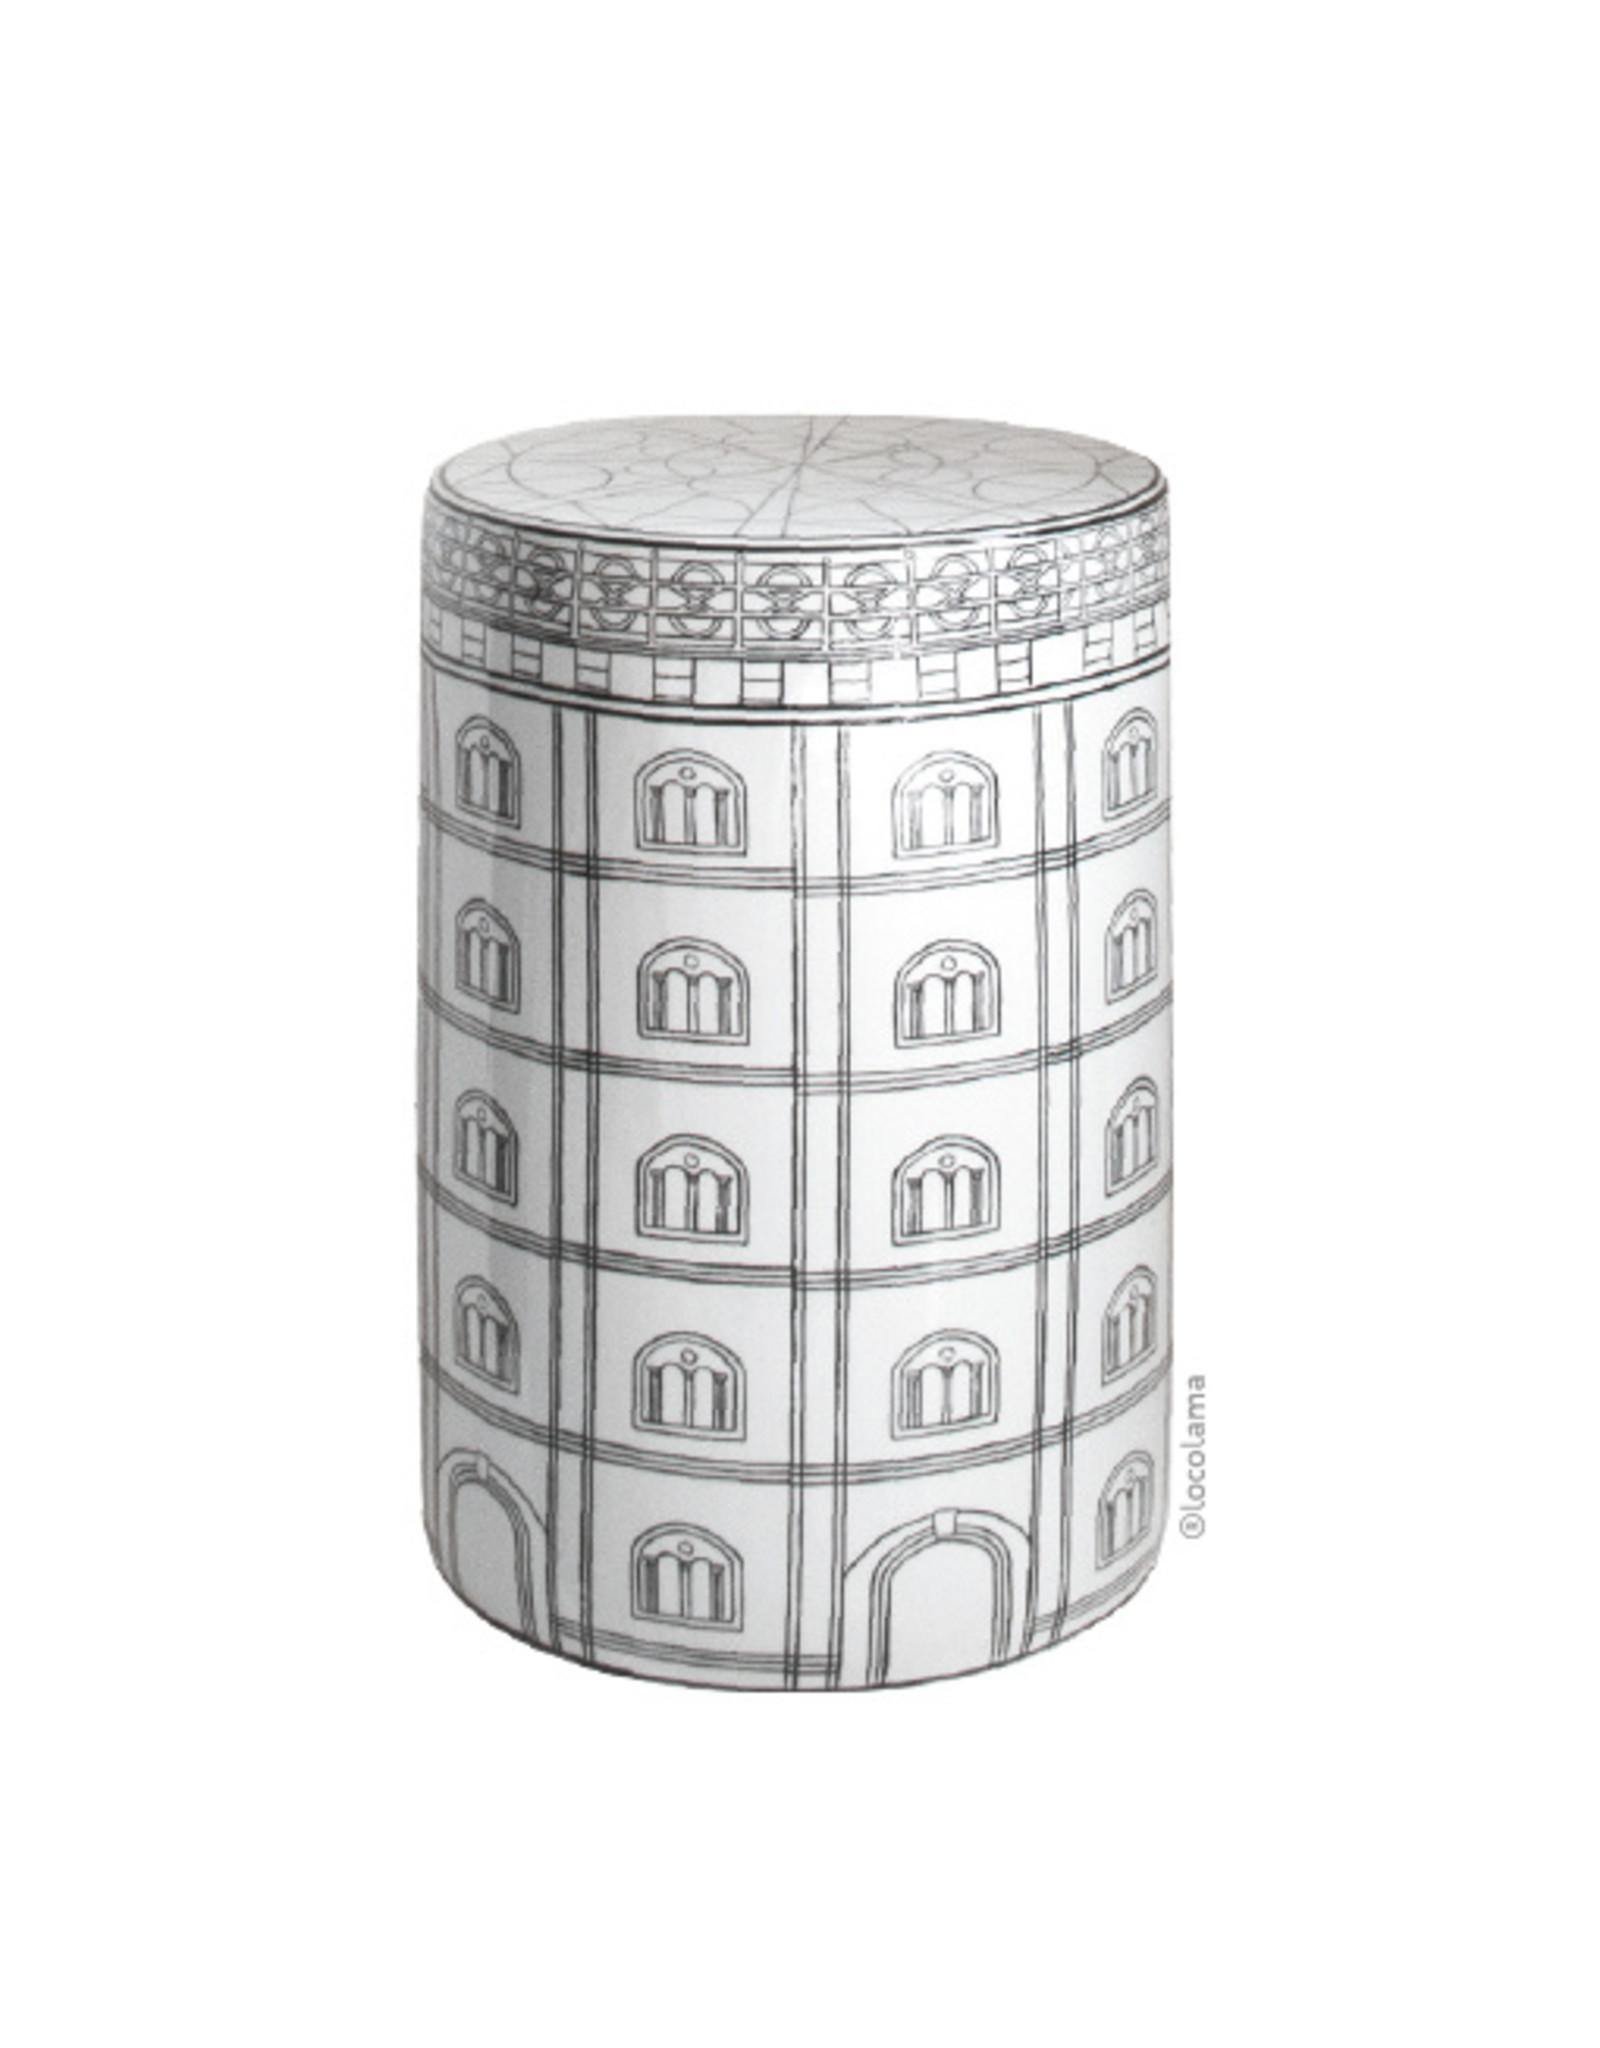 Loco Lama Ceramic Table/Stool Canalhouse